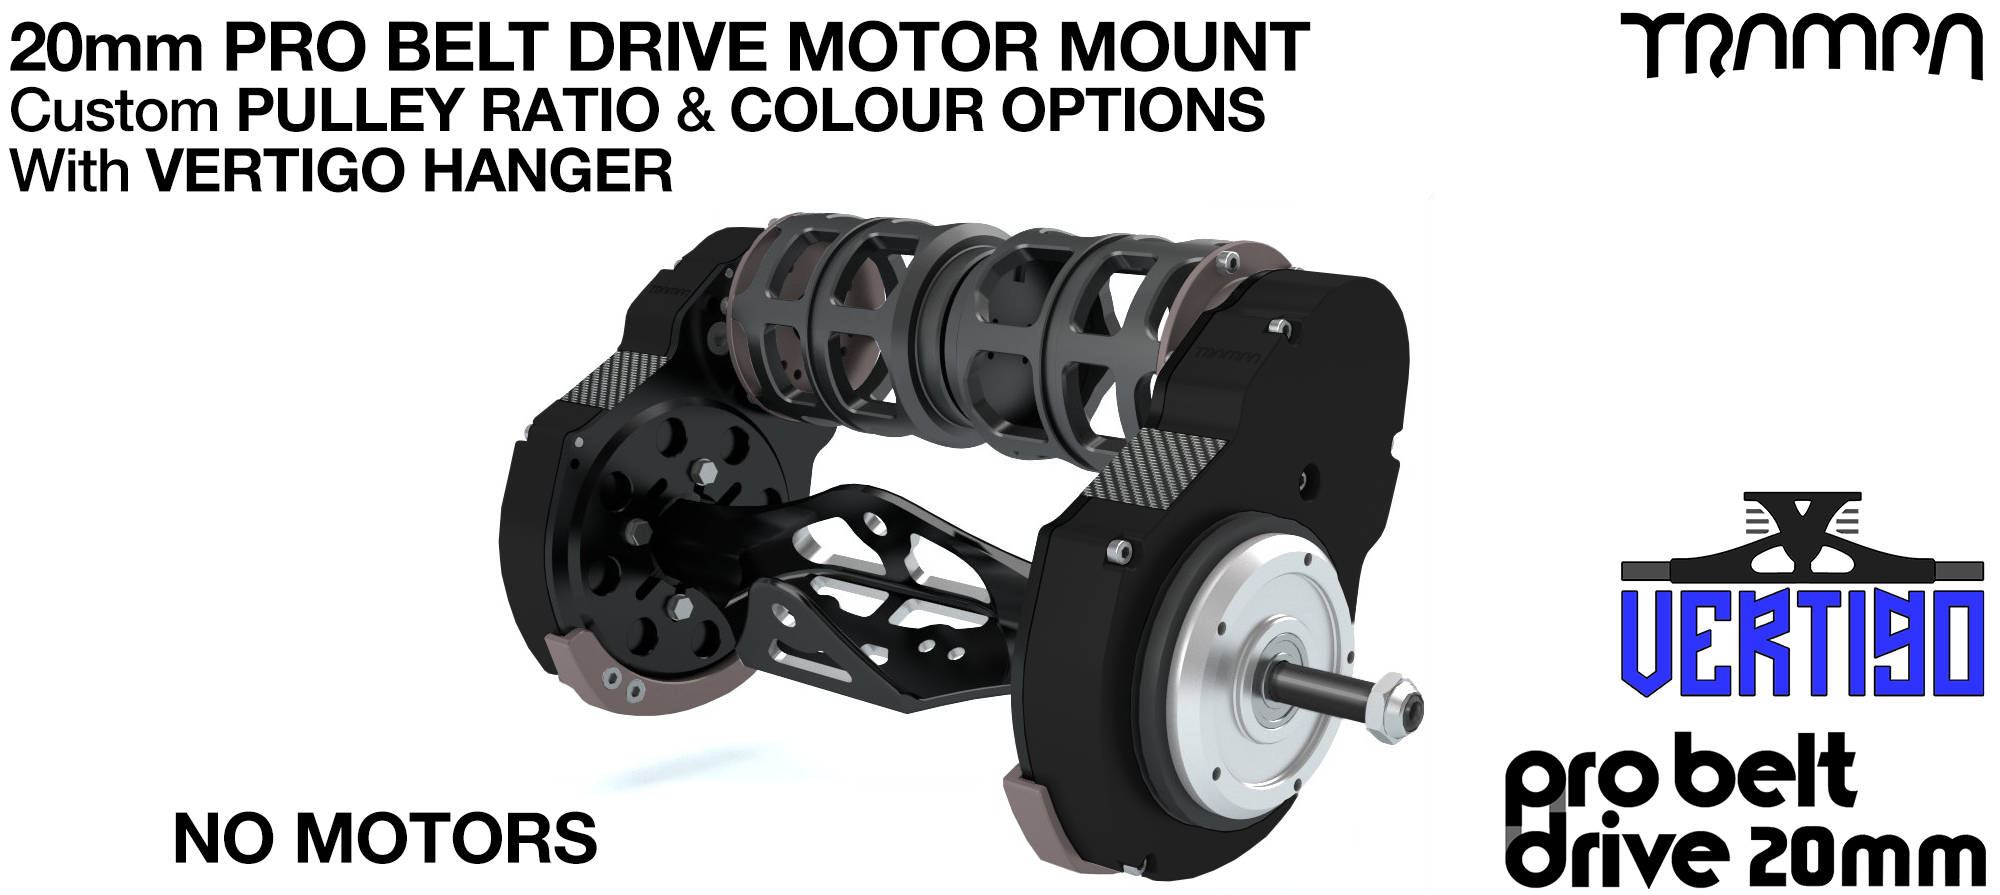 TRAMPA's 20mm  PRO Belt Drive TWIN Motor Mountainboard & Precision VERTIGO Hanger - NO MOTORS